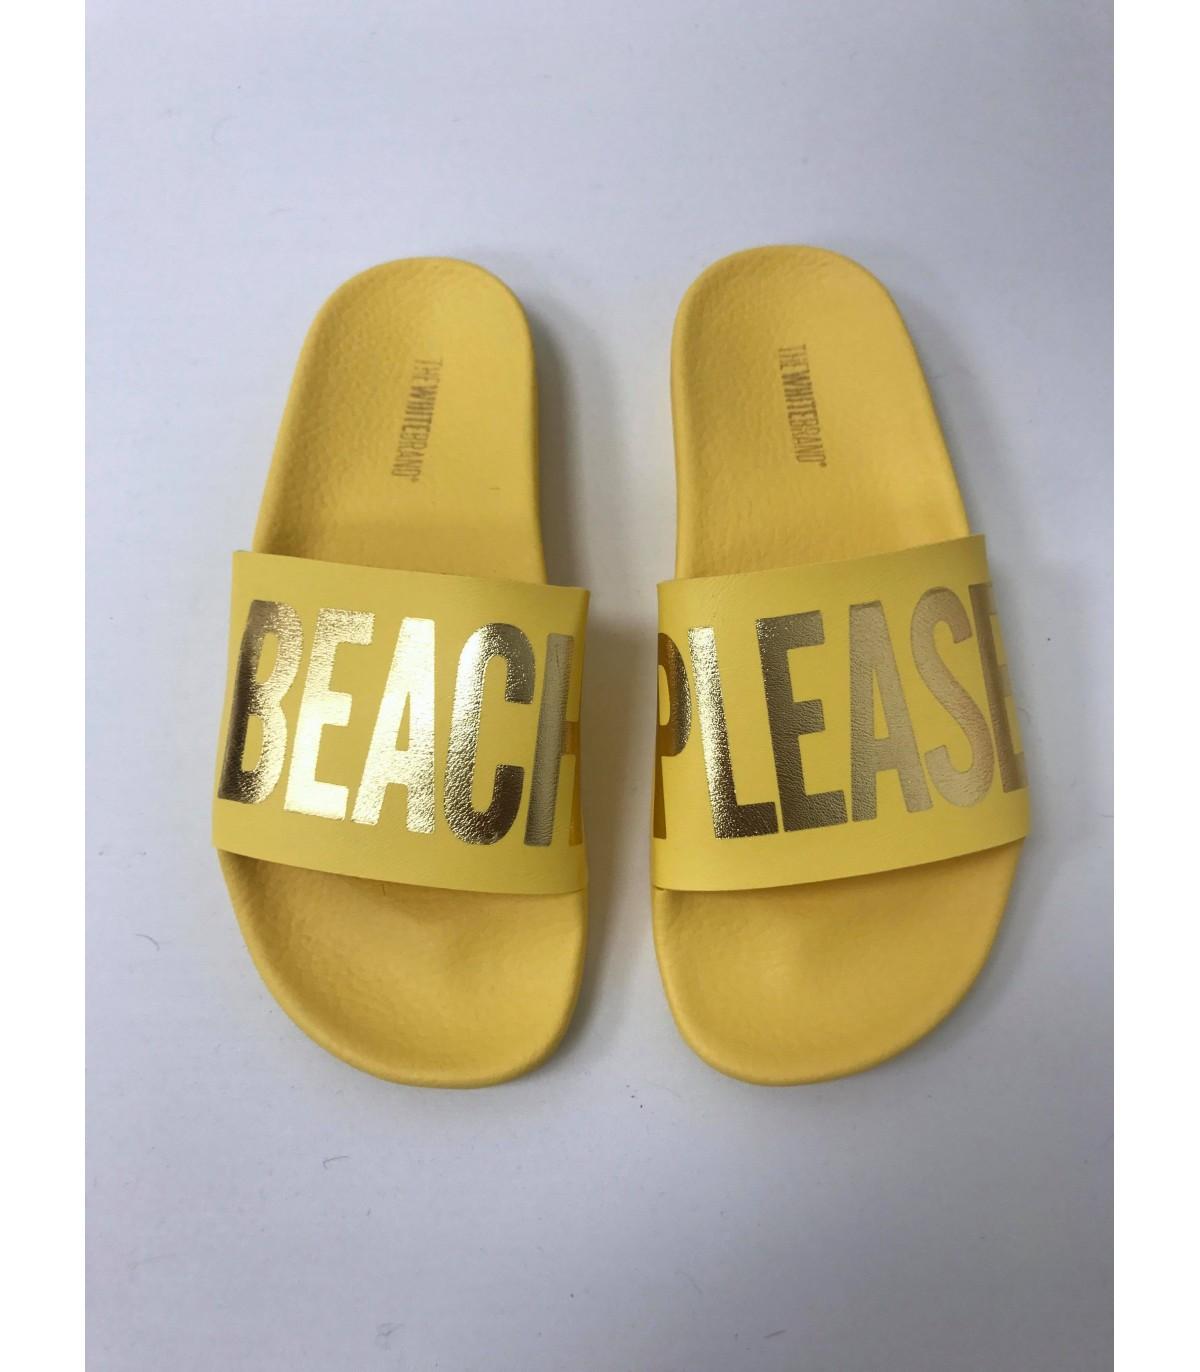 a1136a7ab68 Thewhitebrand Beach yellow Jaune - Chaussures Claquettes GH8HUA1Z -  reborncommunity.fr